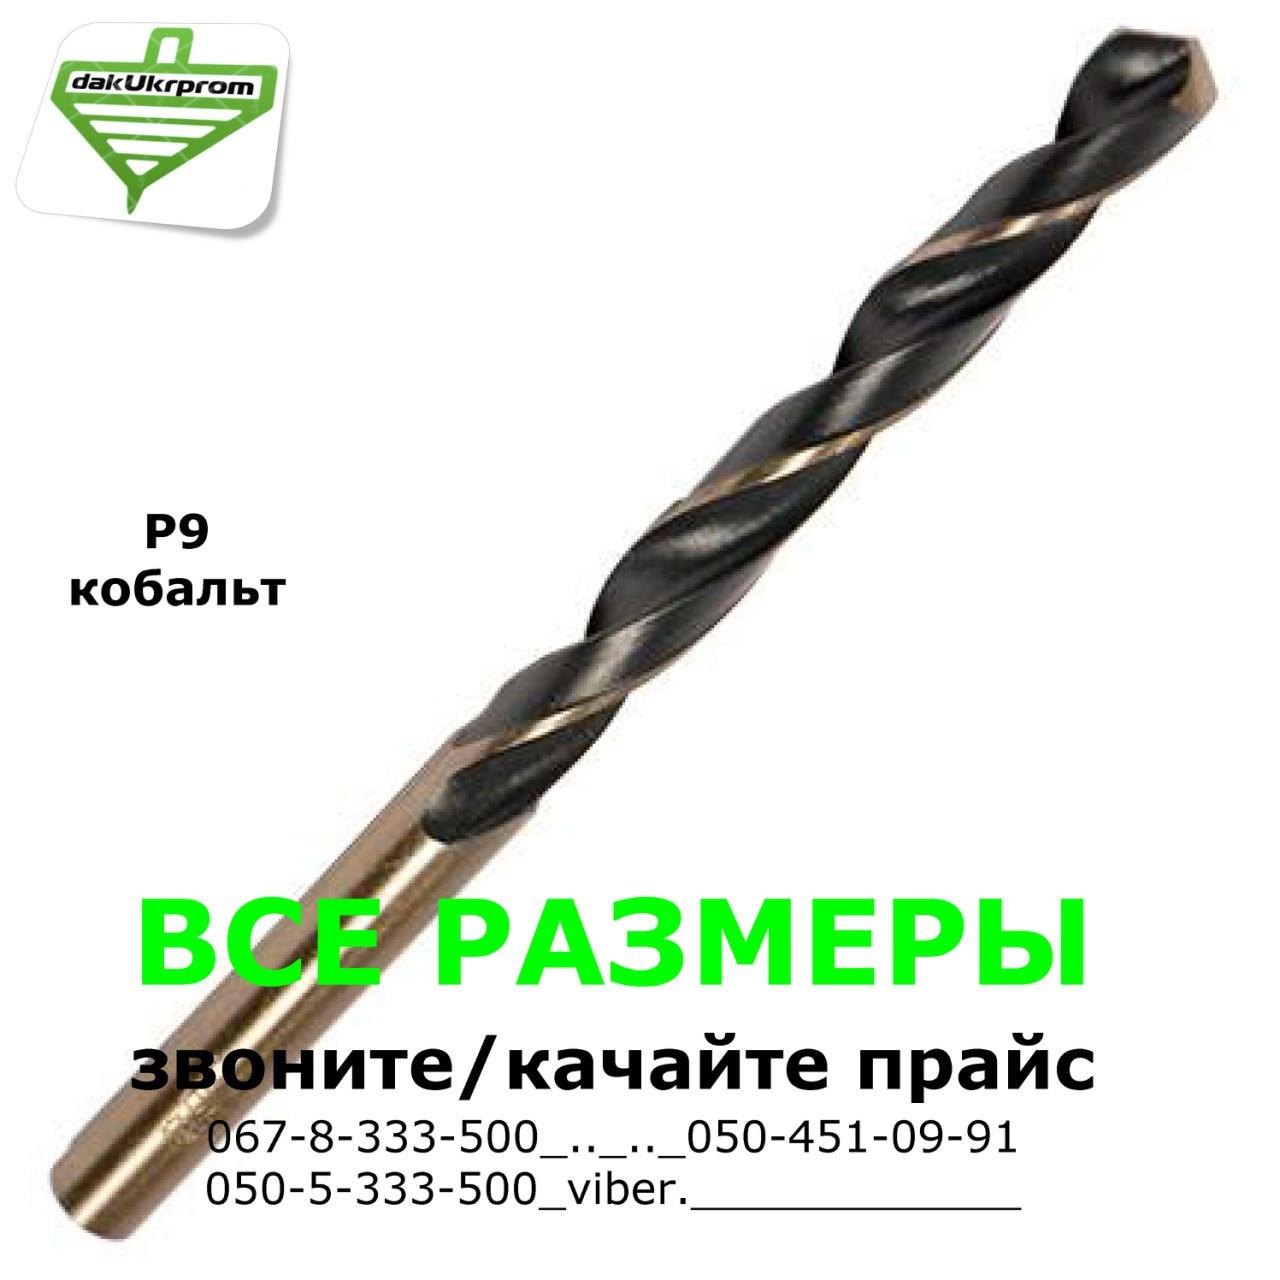 Сверло по металлу 10.0мм  Р9 (кобальт)цилиндрический хвостовик